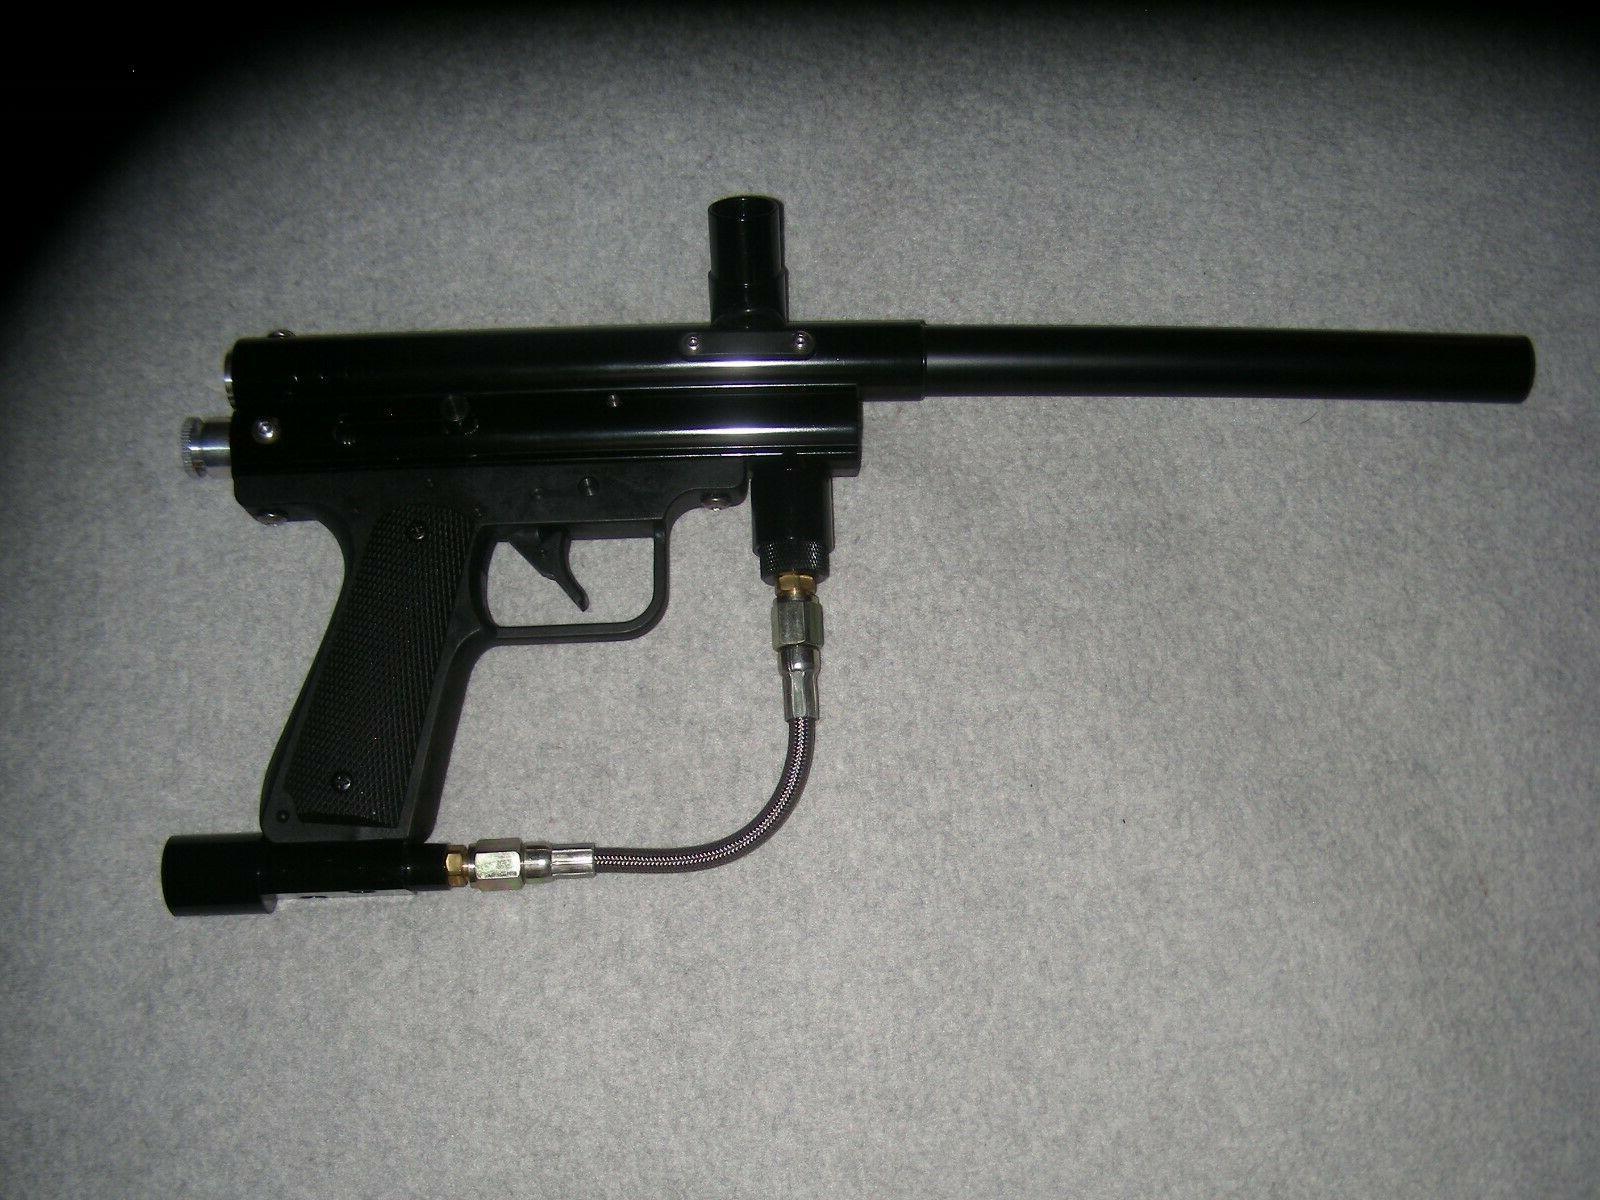 Bruizar S.O.B. Ball Gun Black